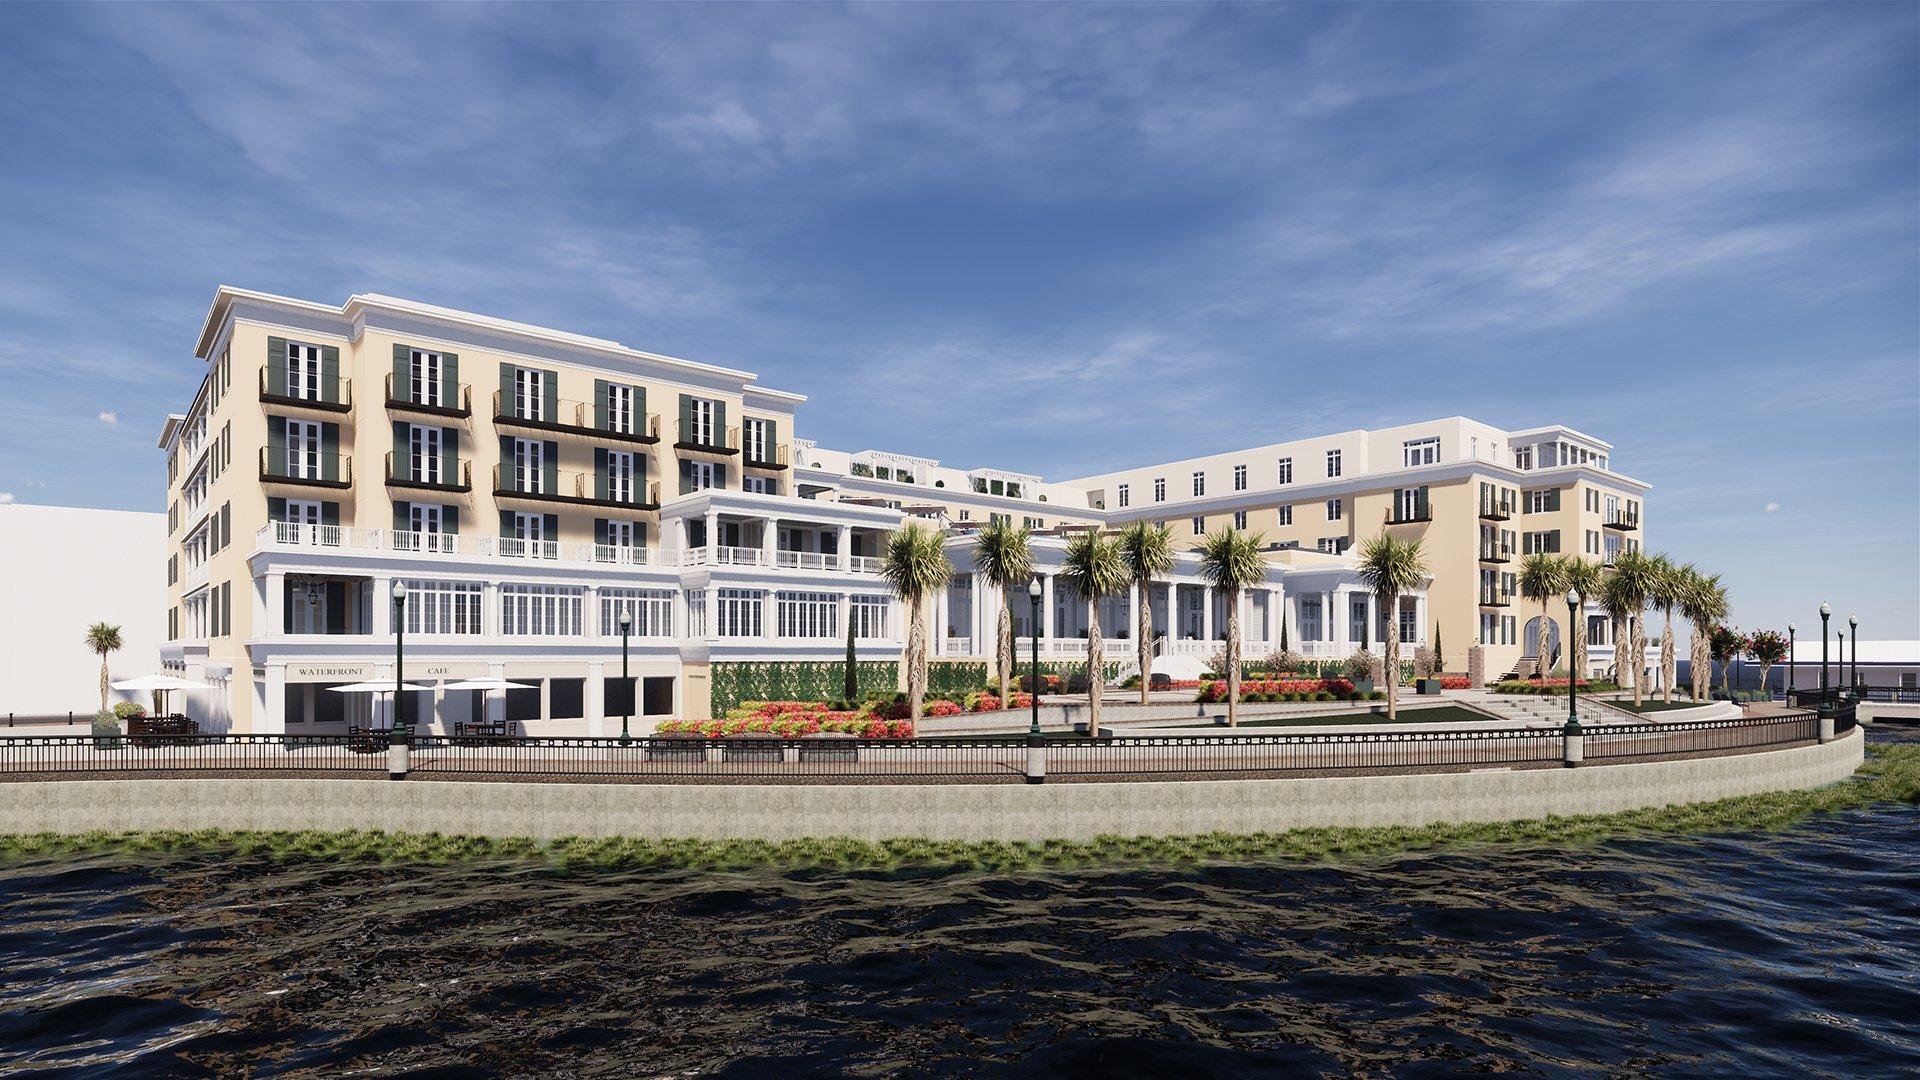 Charleston Waterfront Hotel